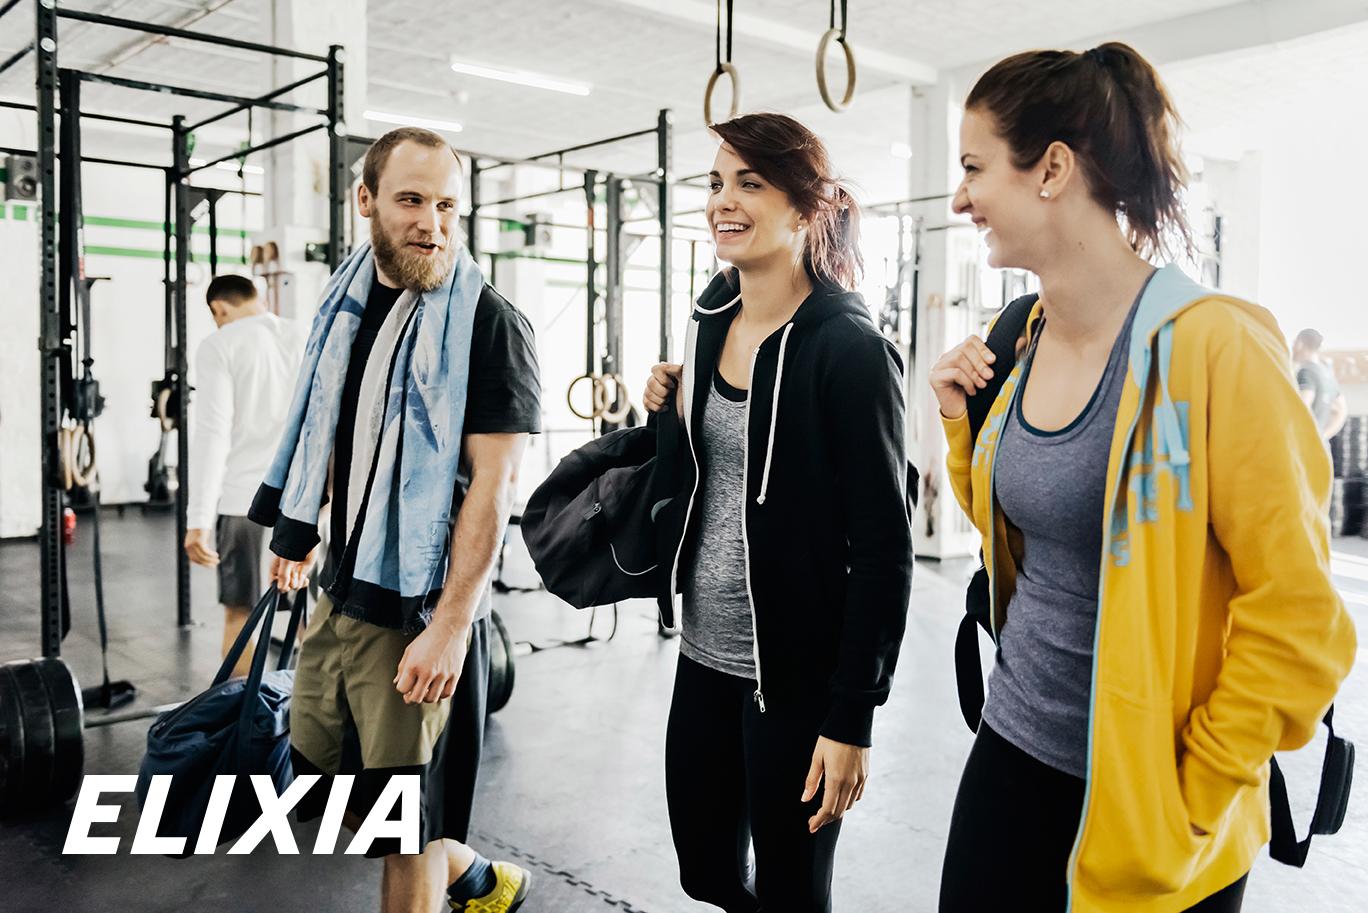 Elixia-jäsenedut